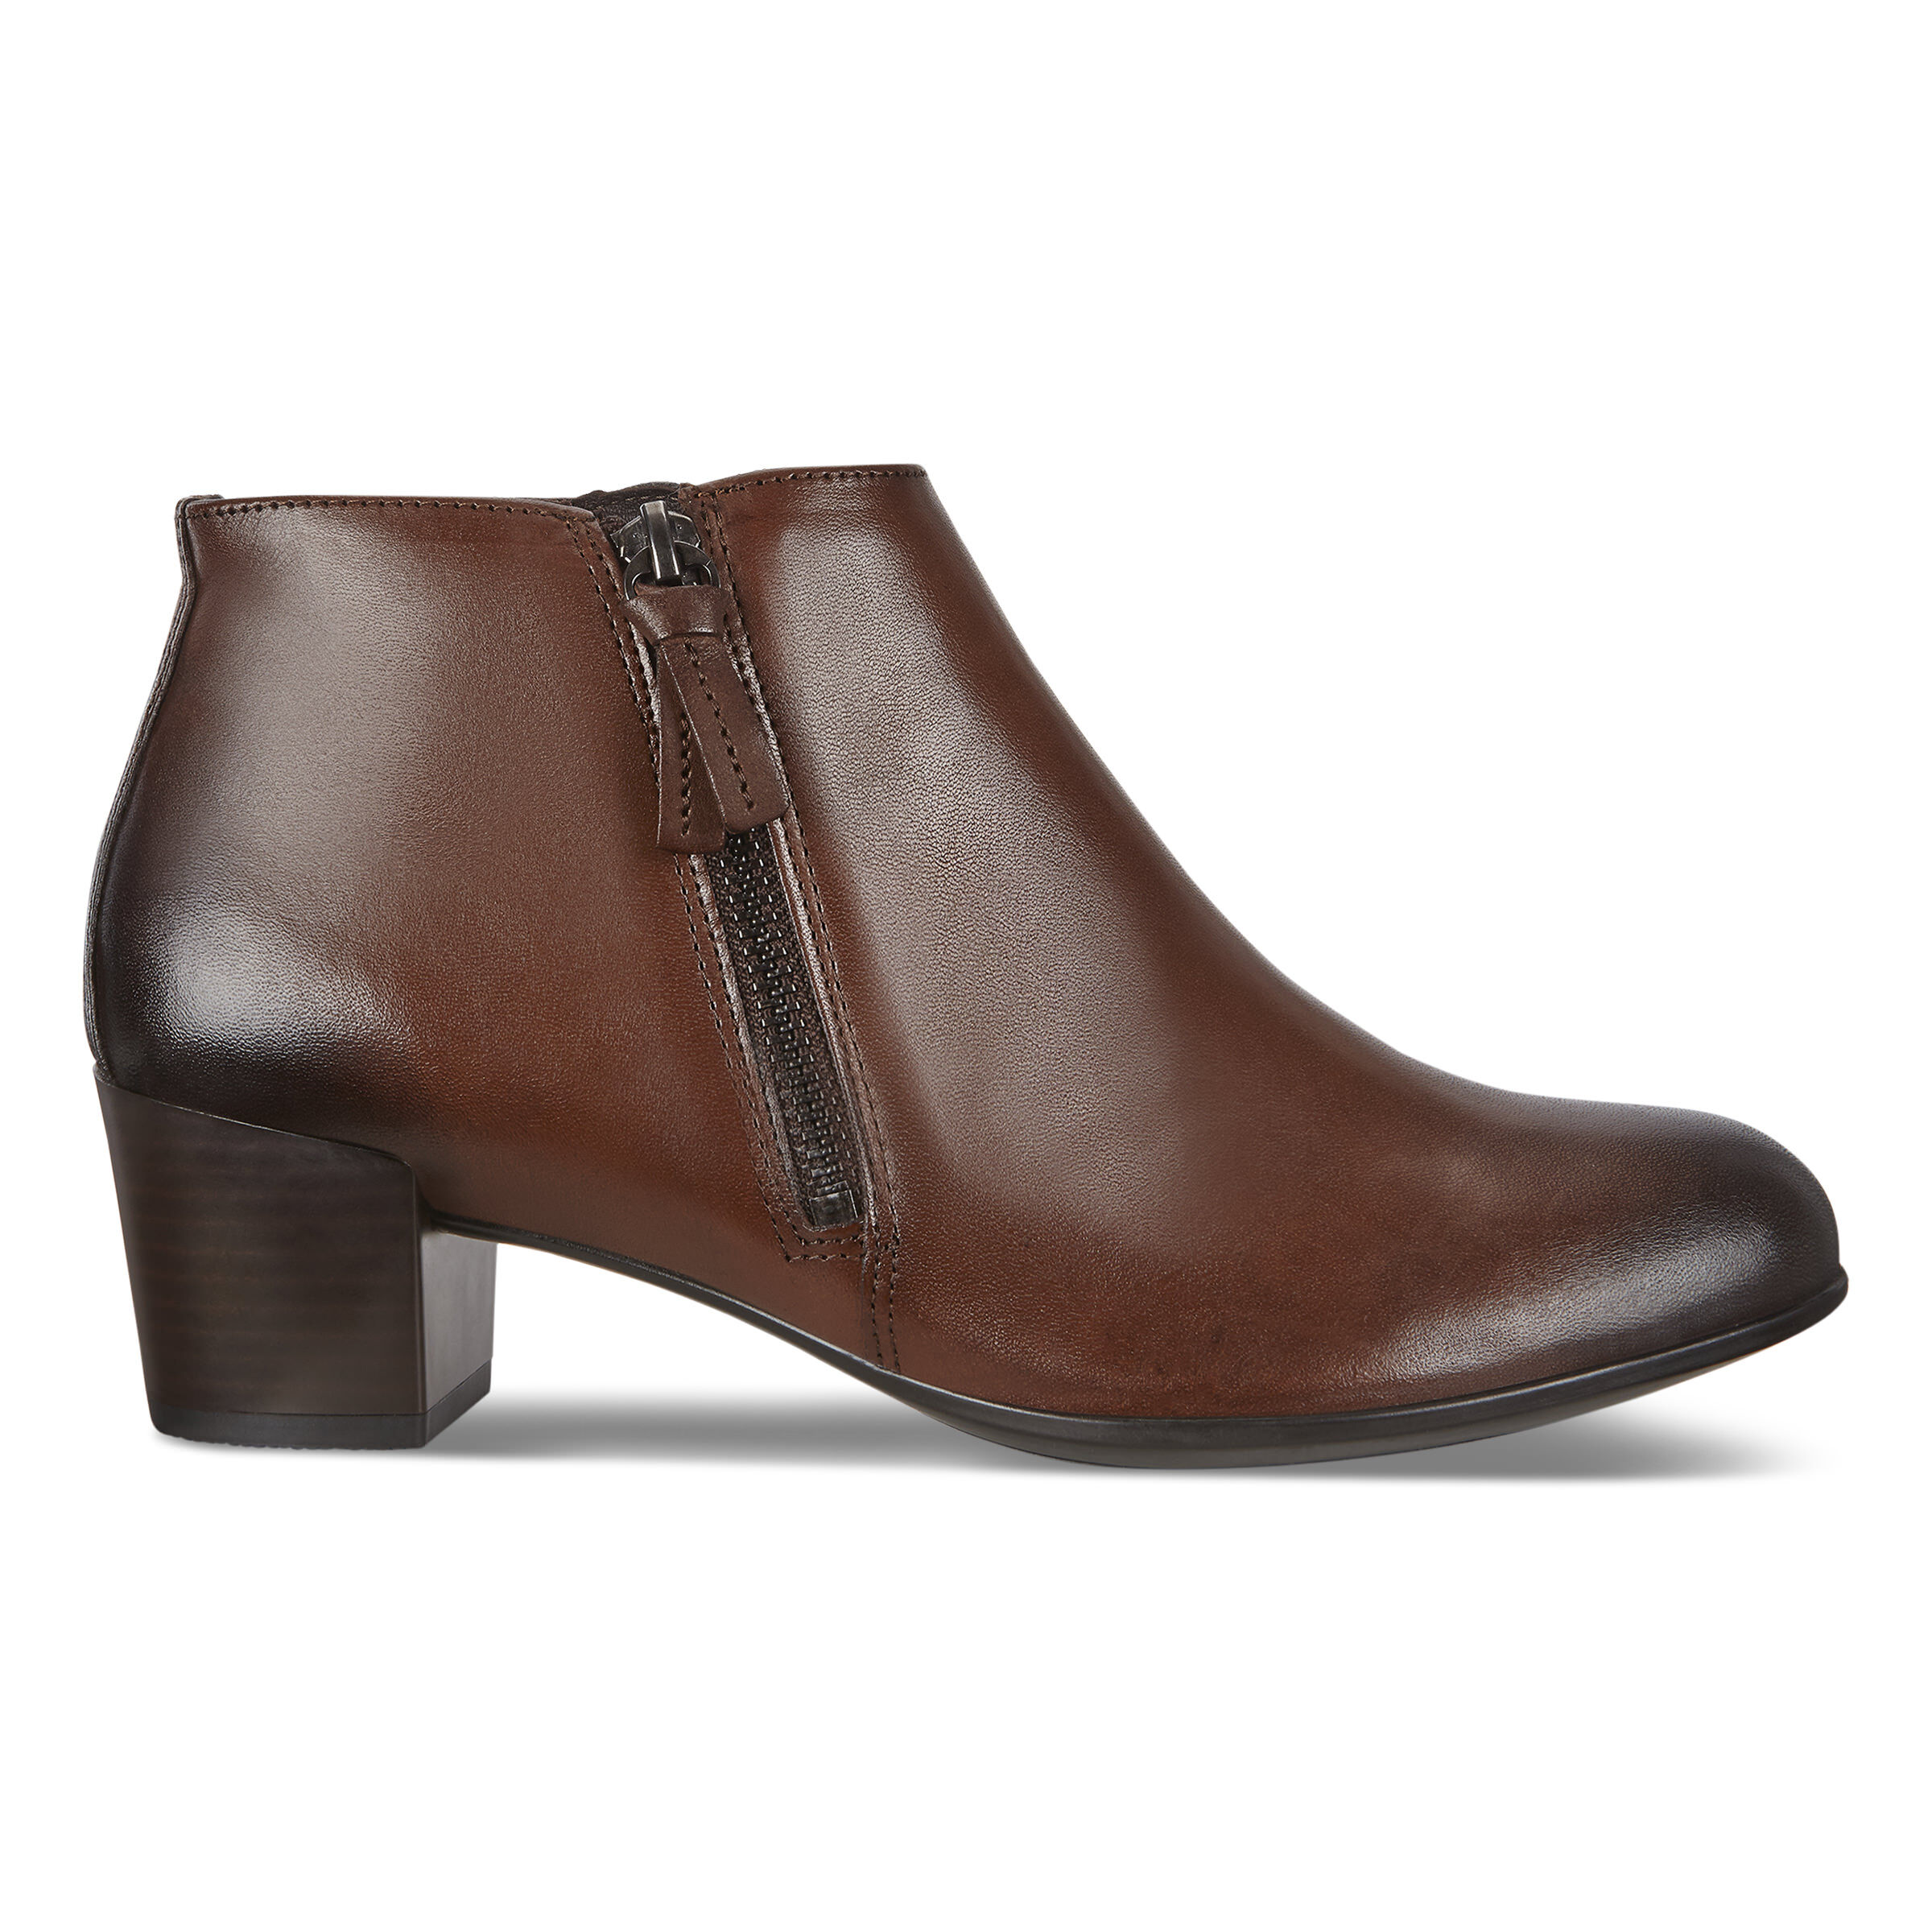 ECCO Women/'s Shape M 35 Ankle Bootie Boot